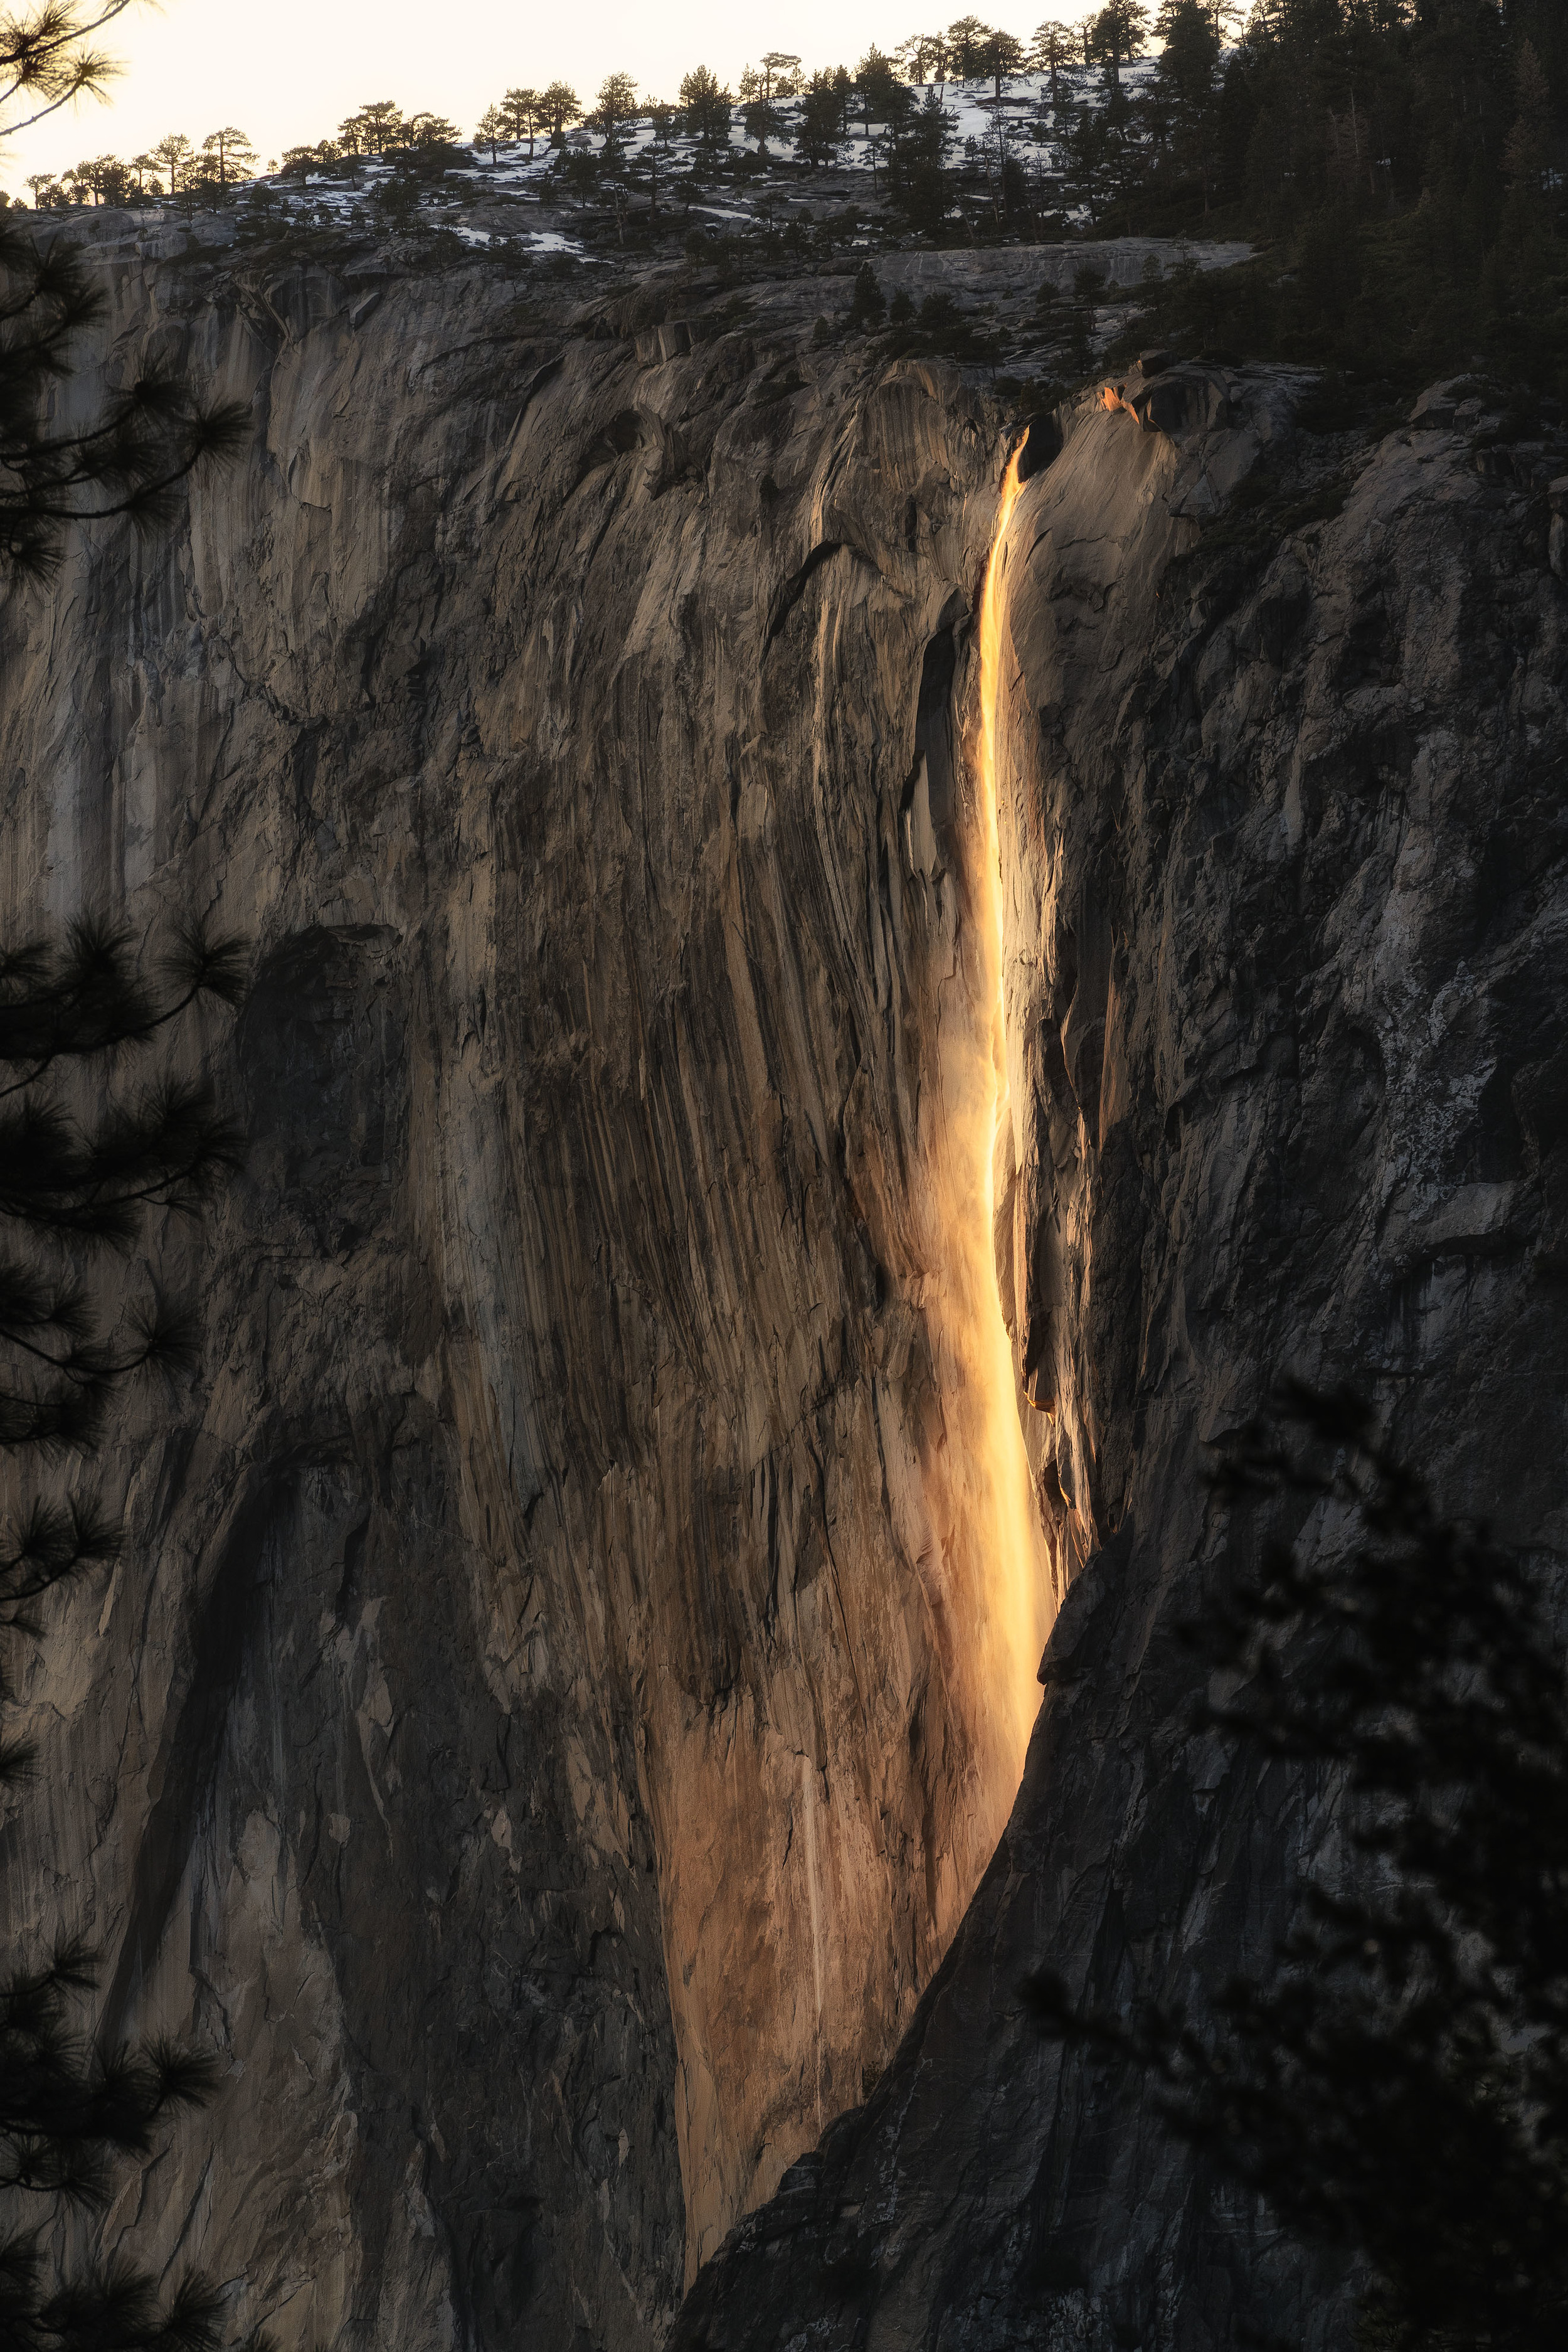 Fire Fall Yosemite National Park - California